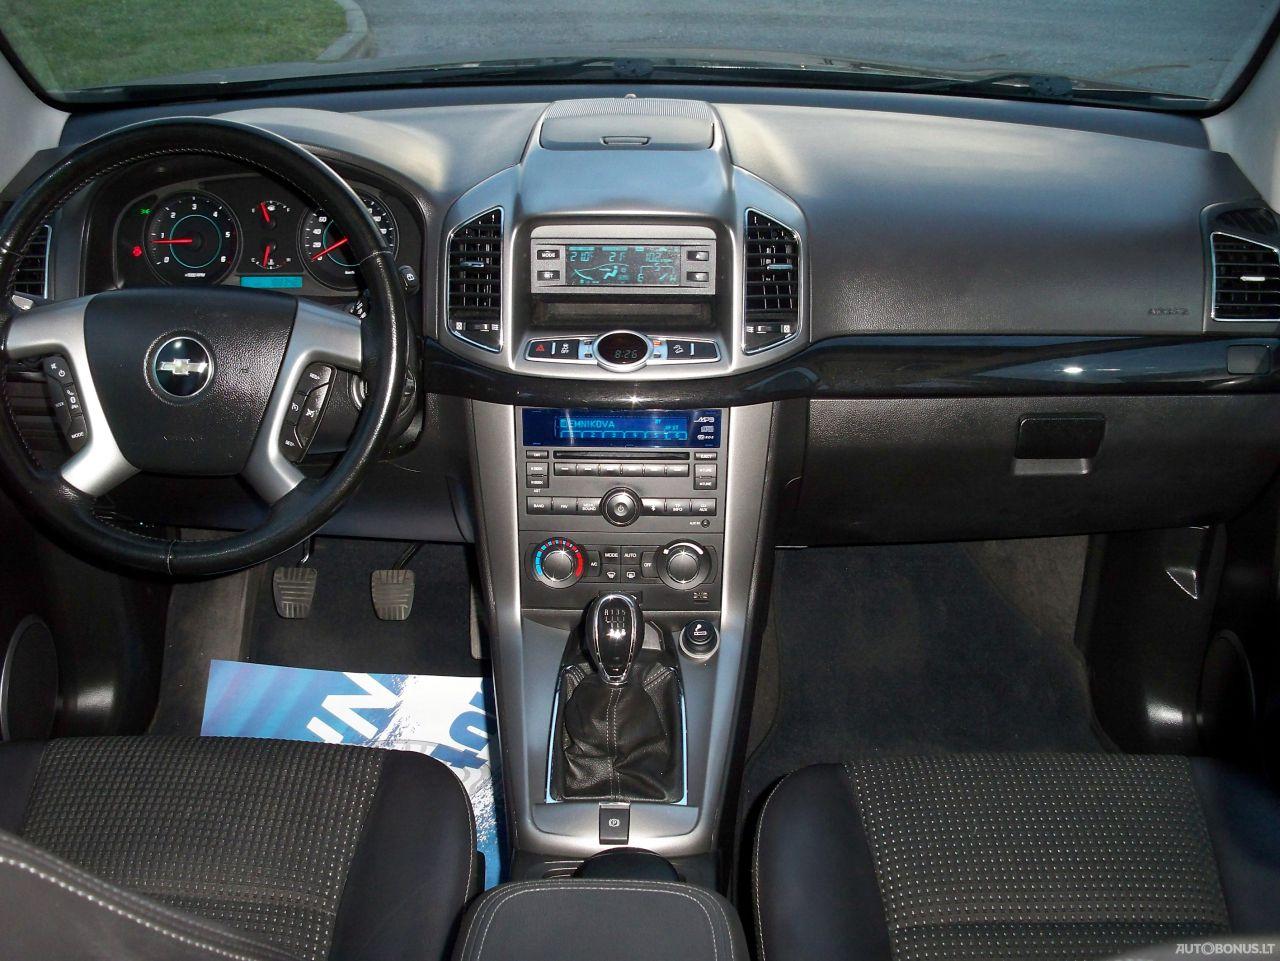 Chevrolet Captiva, Visureigis, 2011-12 | 17